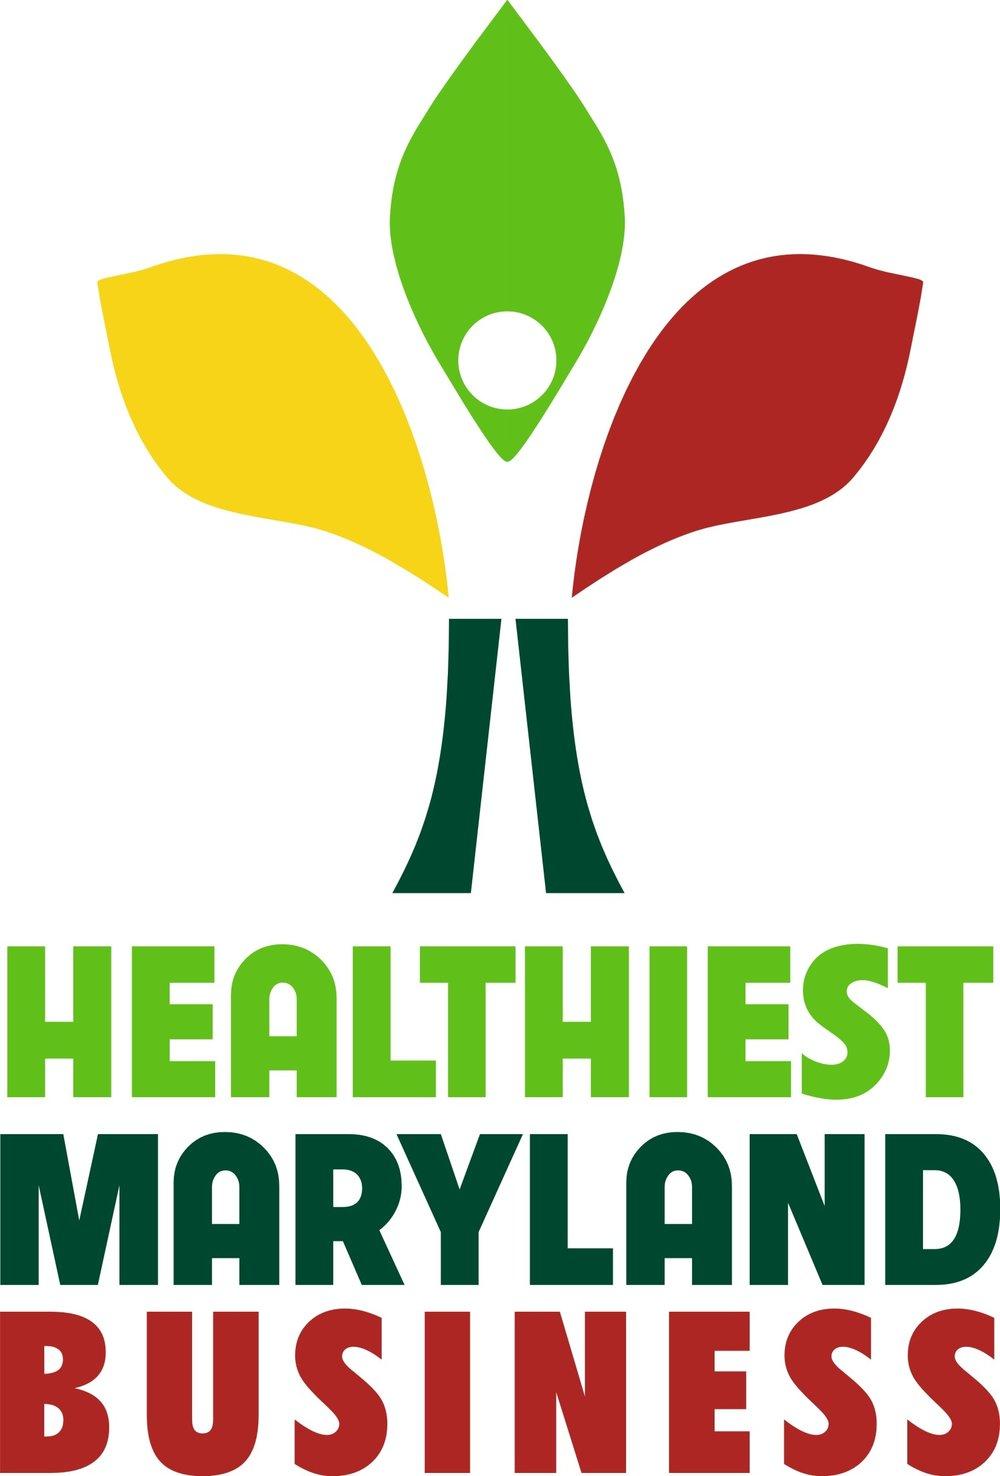 Healthiest Maryland Business Logo.JPG